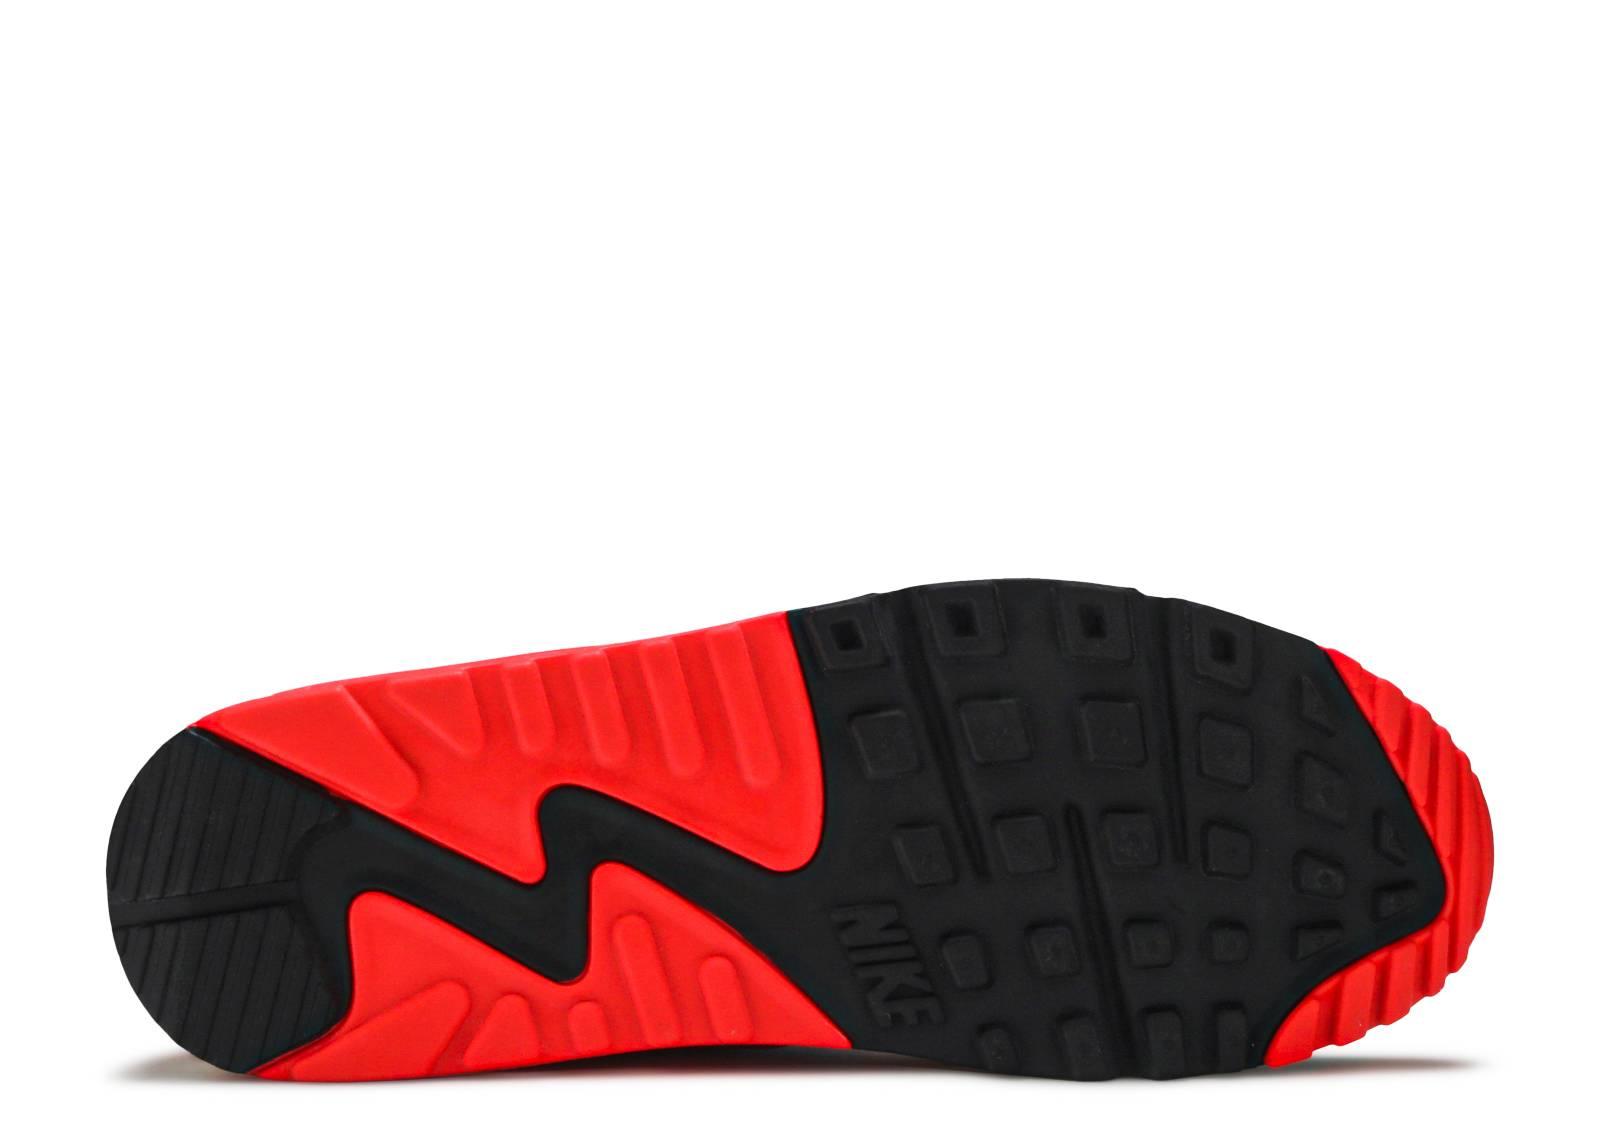 Nike Air Max 90 Infrared Lunar rockhavenrecovery.ca